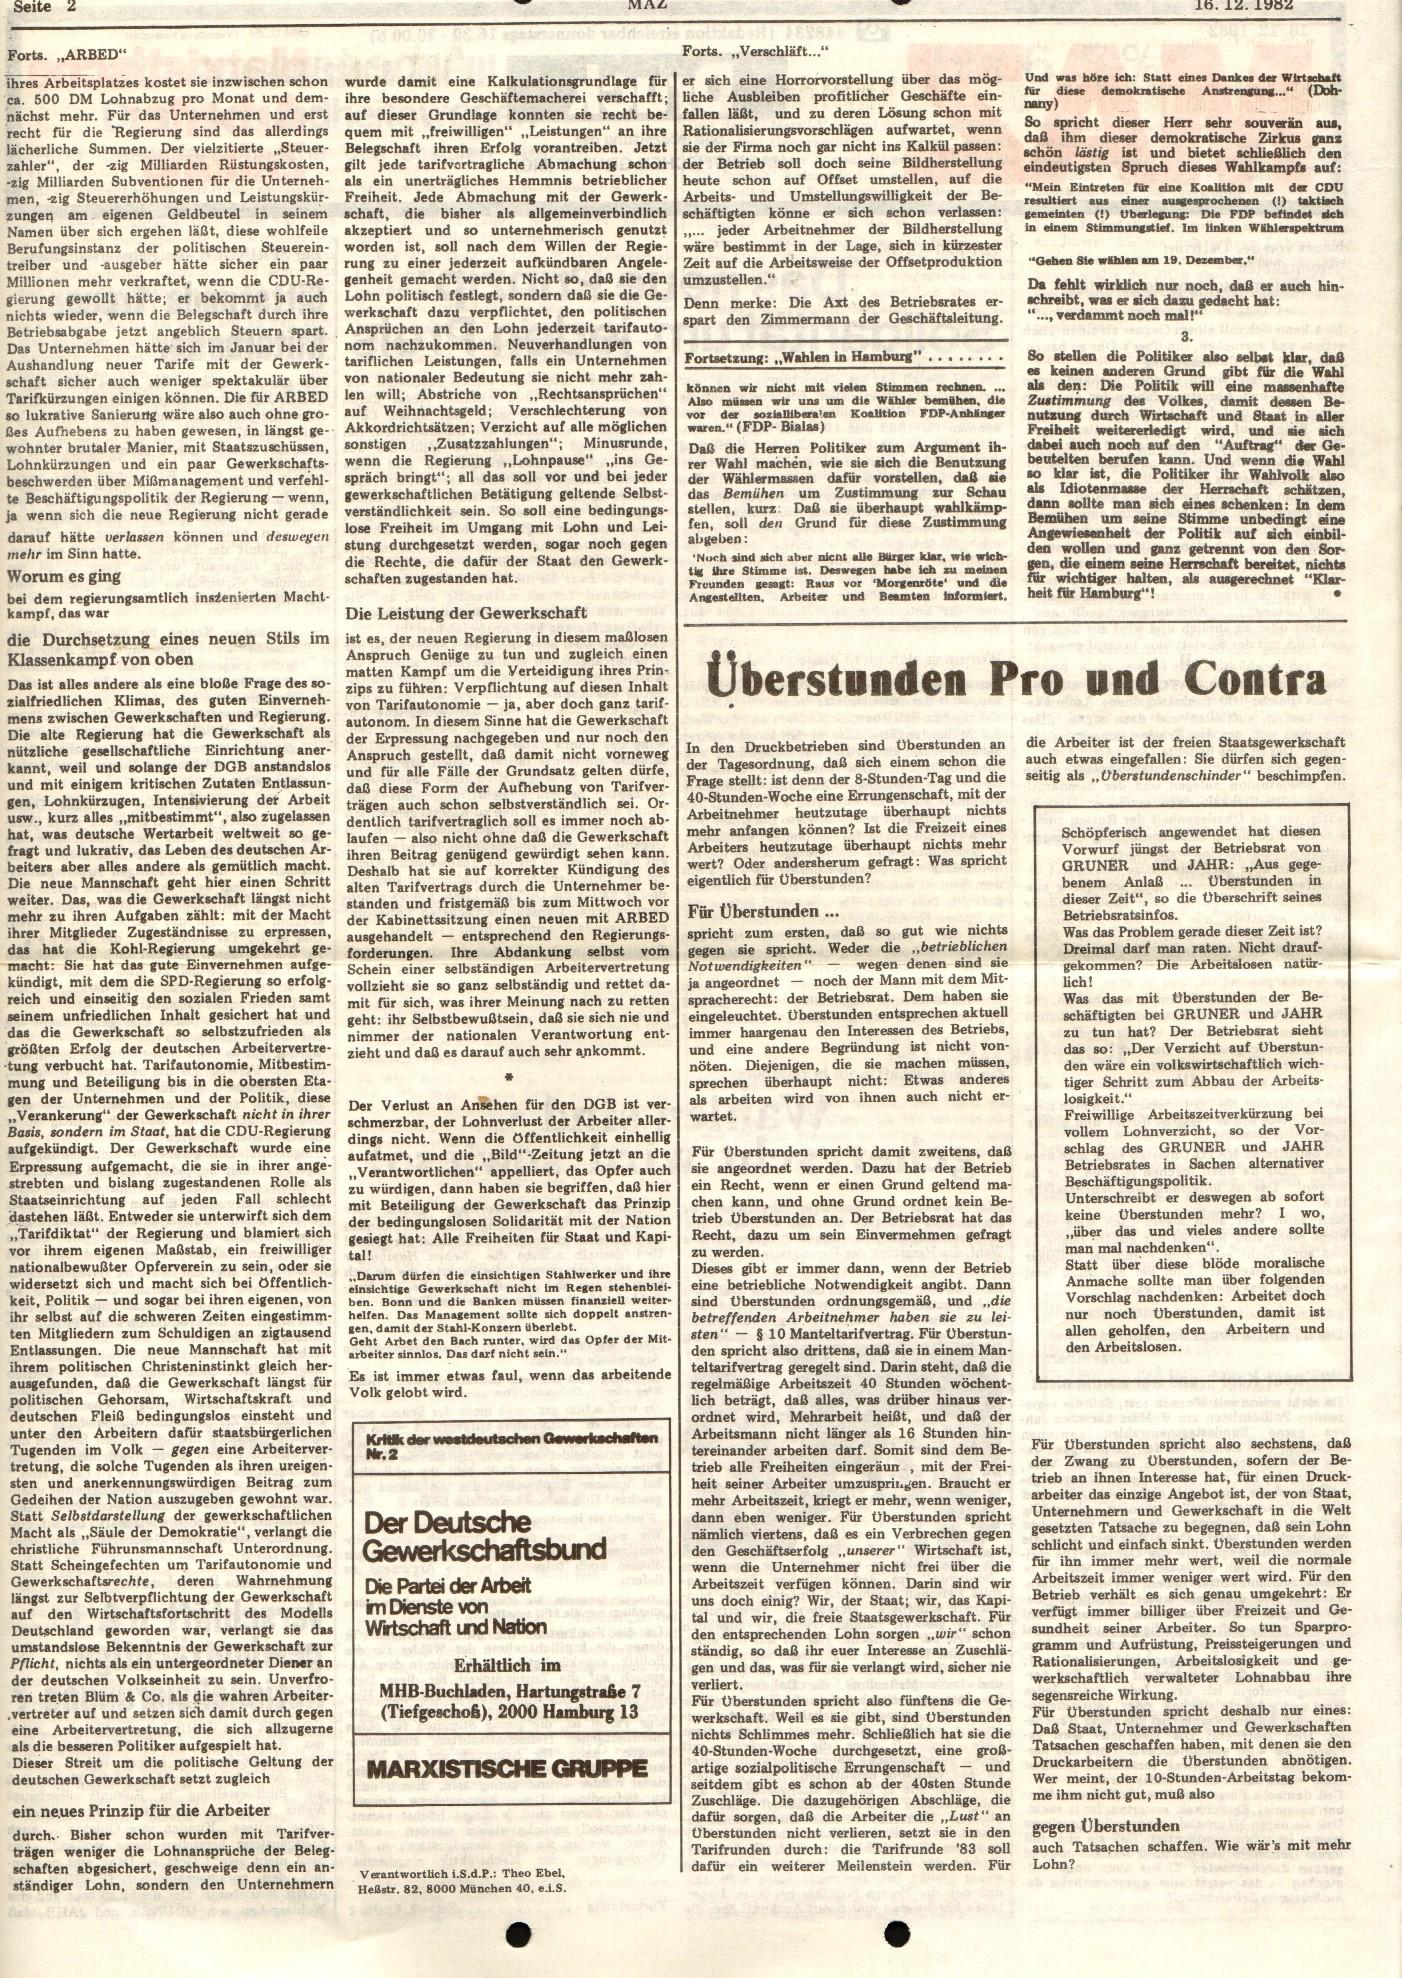 Hamburg_MG_MAZ_Druck_19821216_02